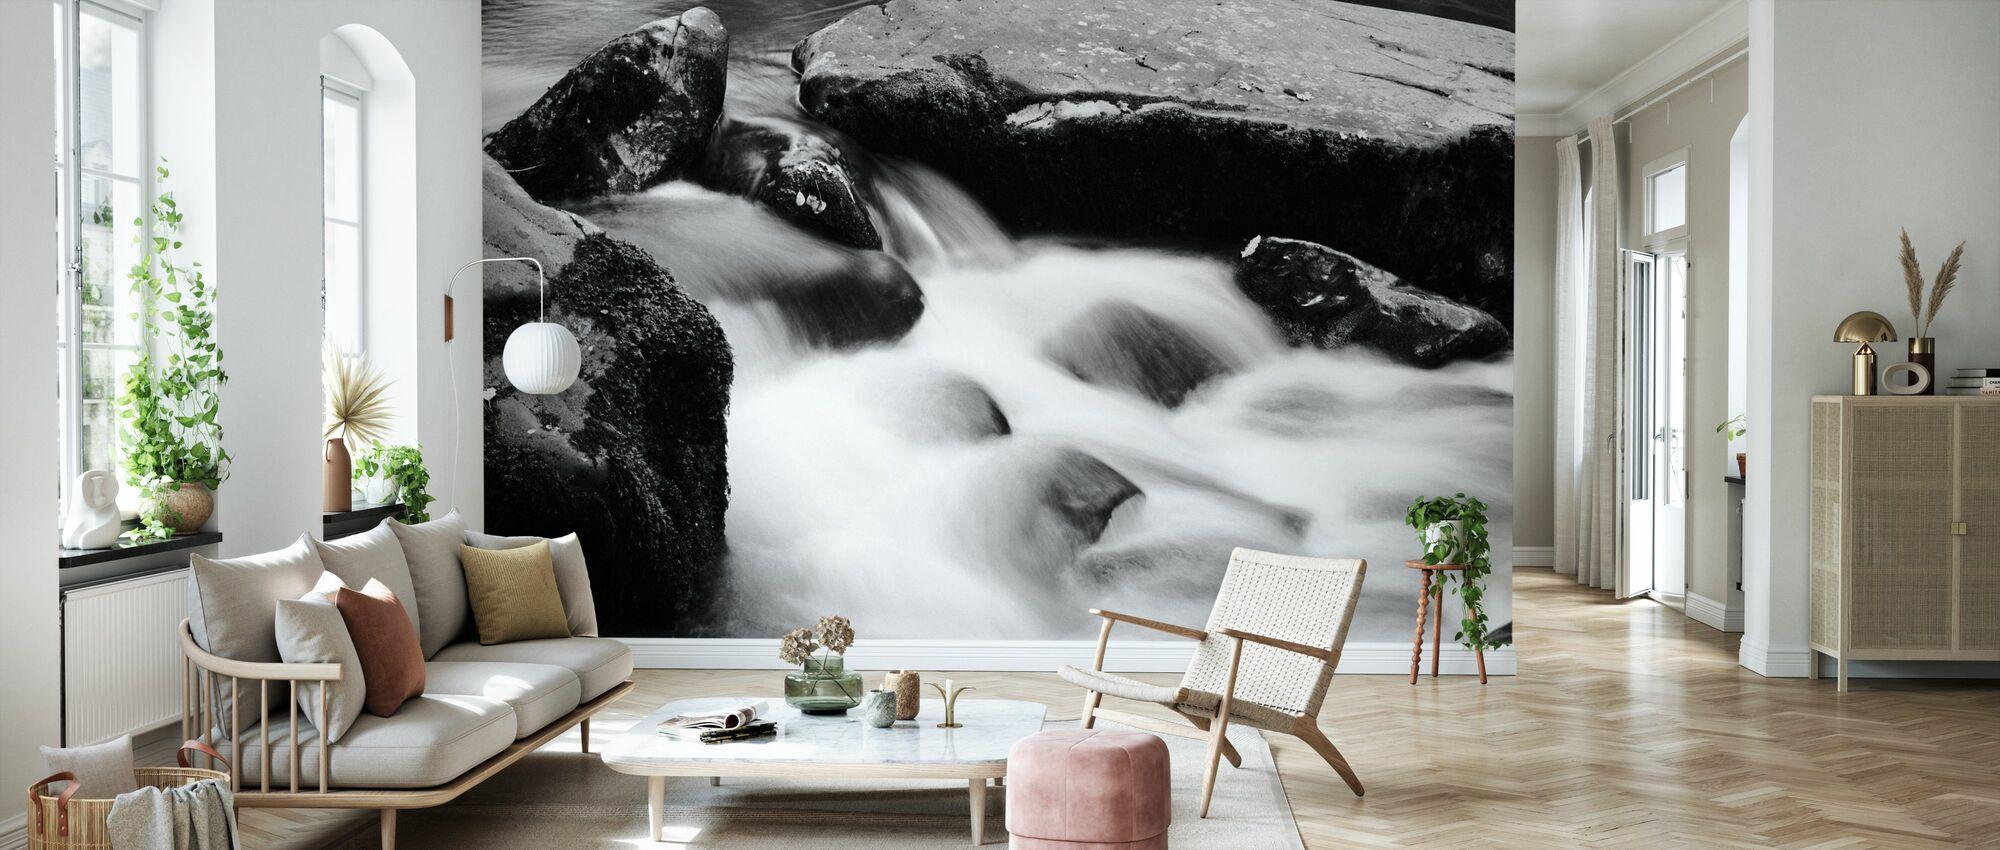 River Mawddach - b/w - Wallpaper - Living Room